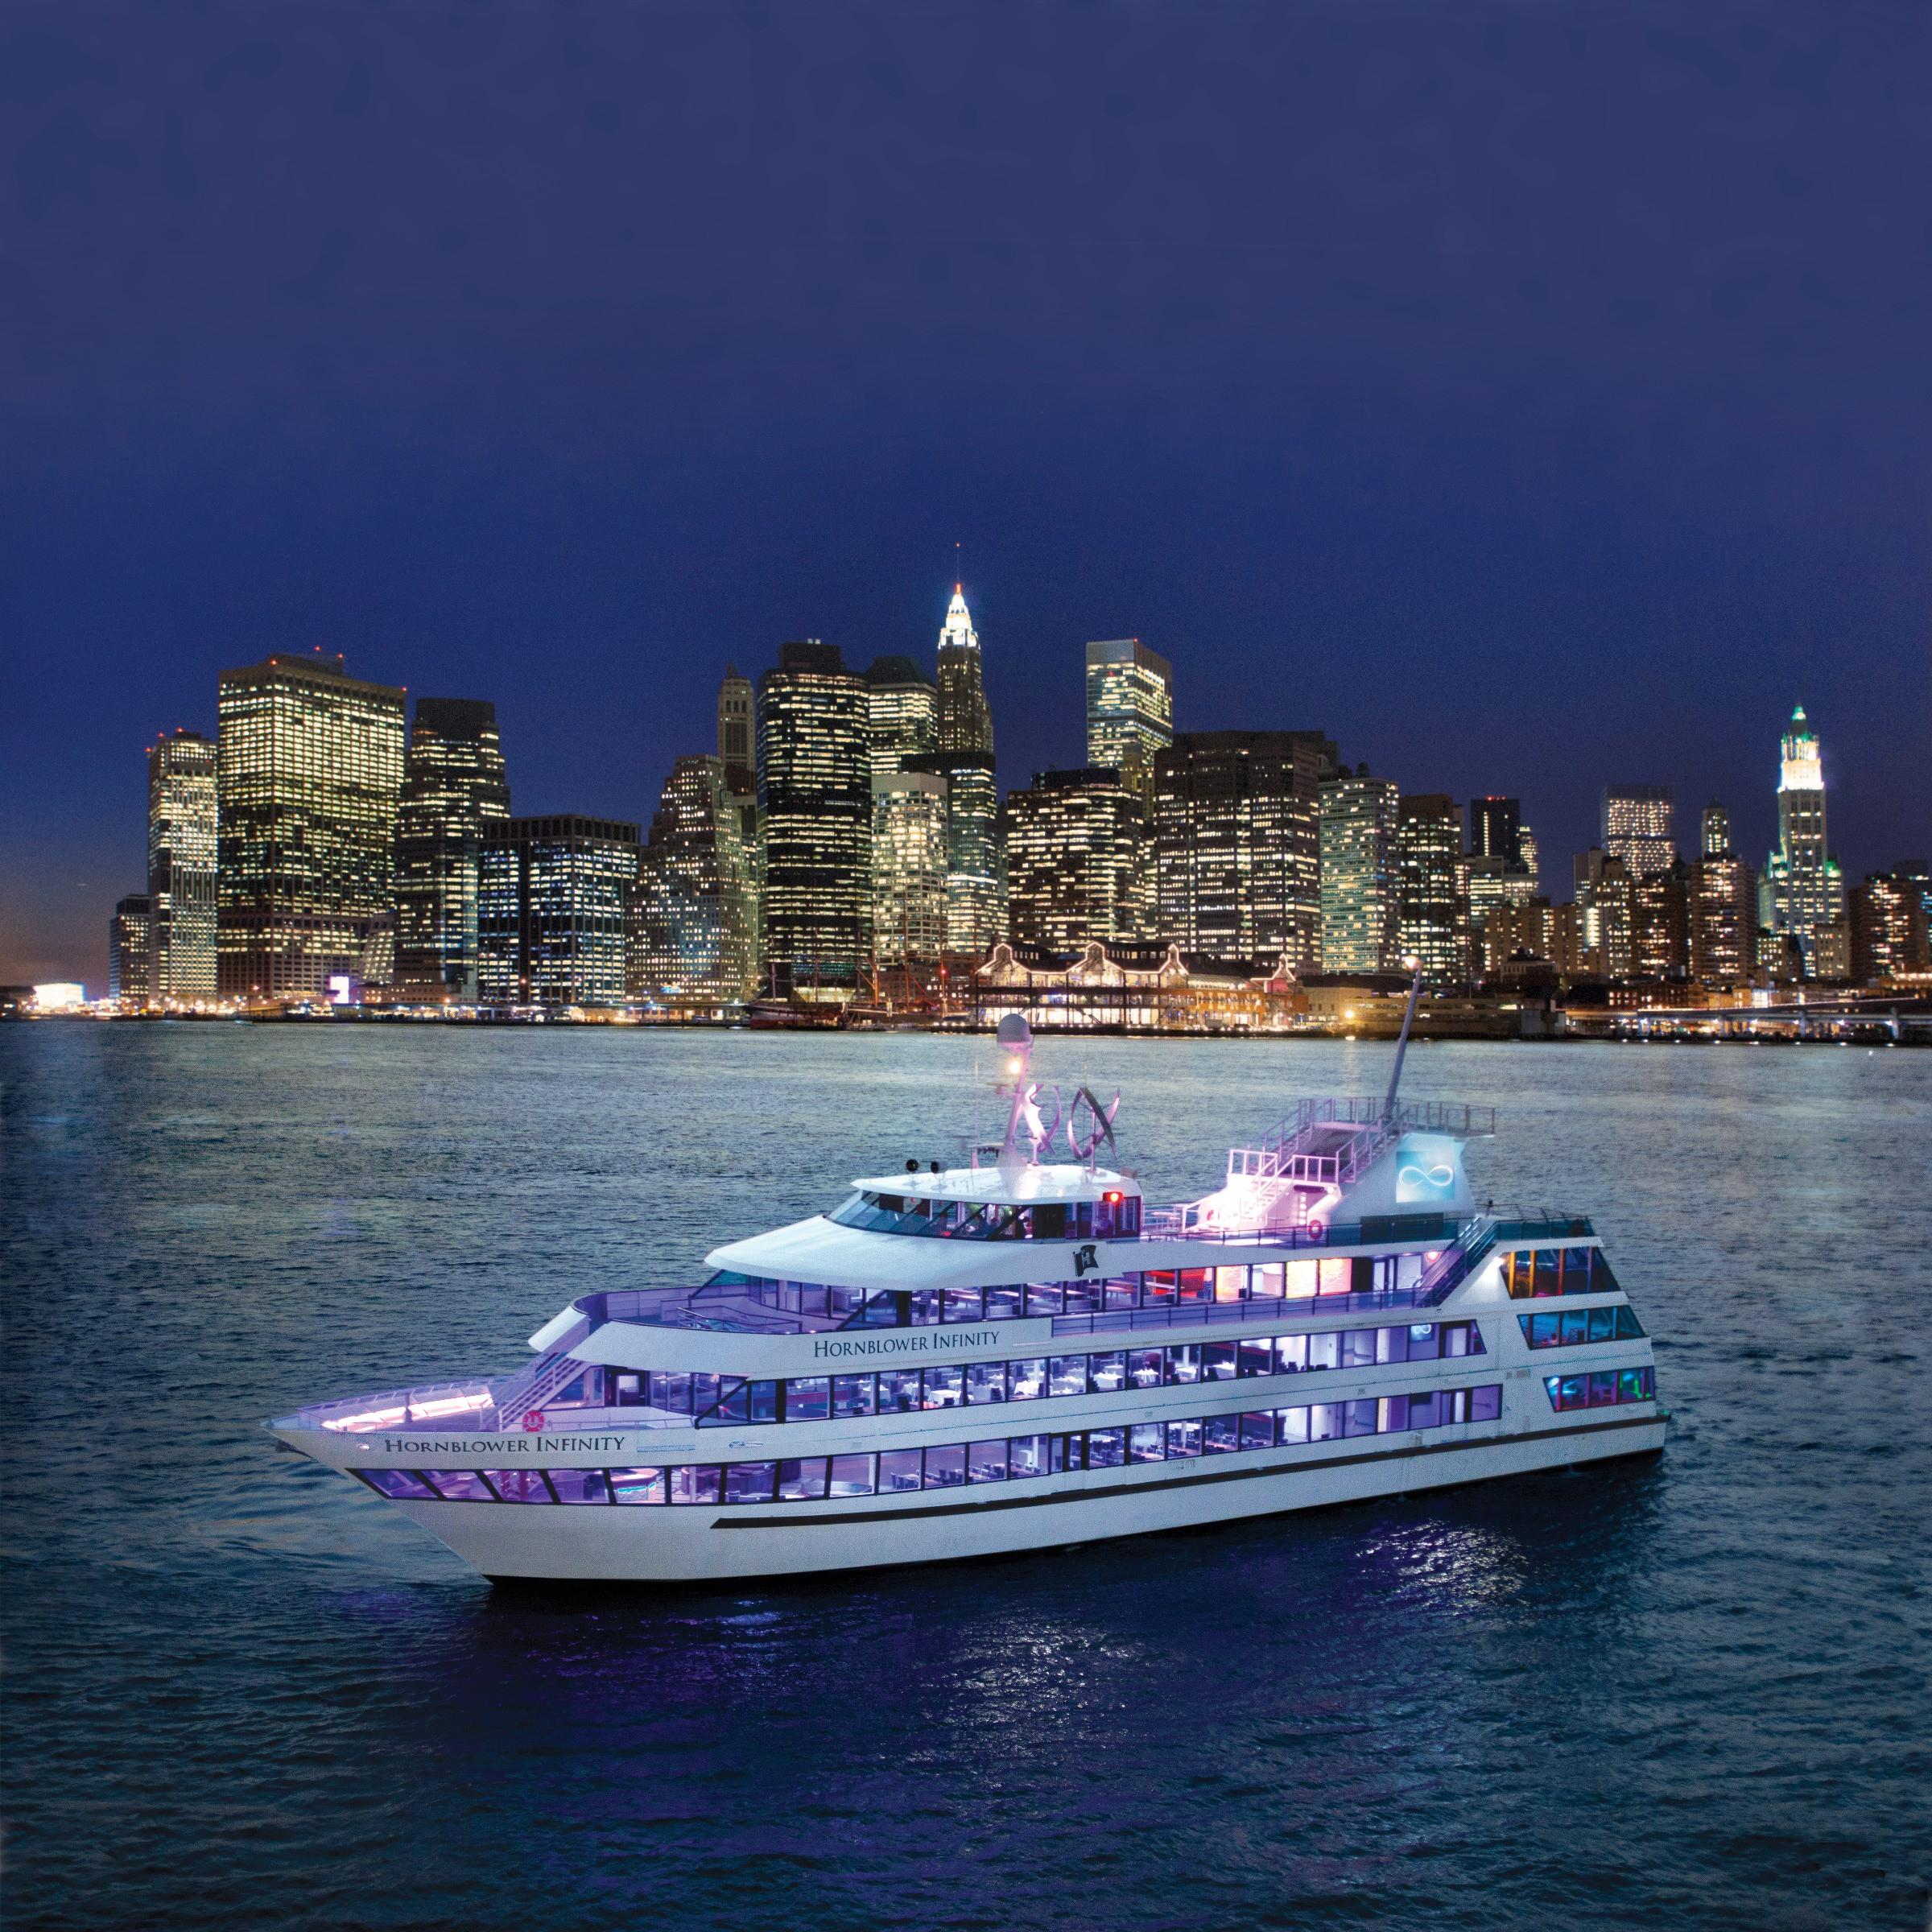 Cruise Dinner Nyc  Hornblower Dining Cruises on Hudson